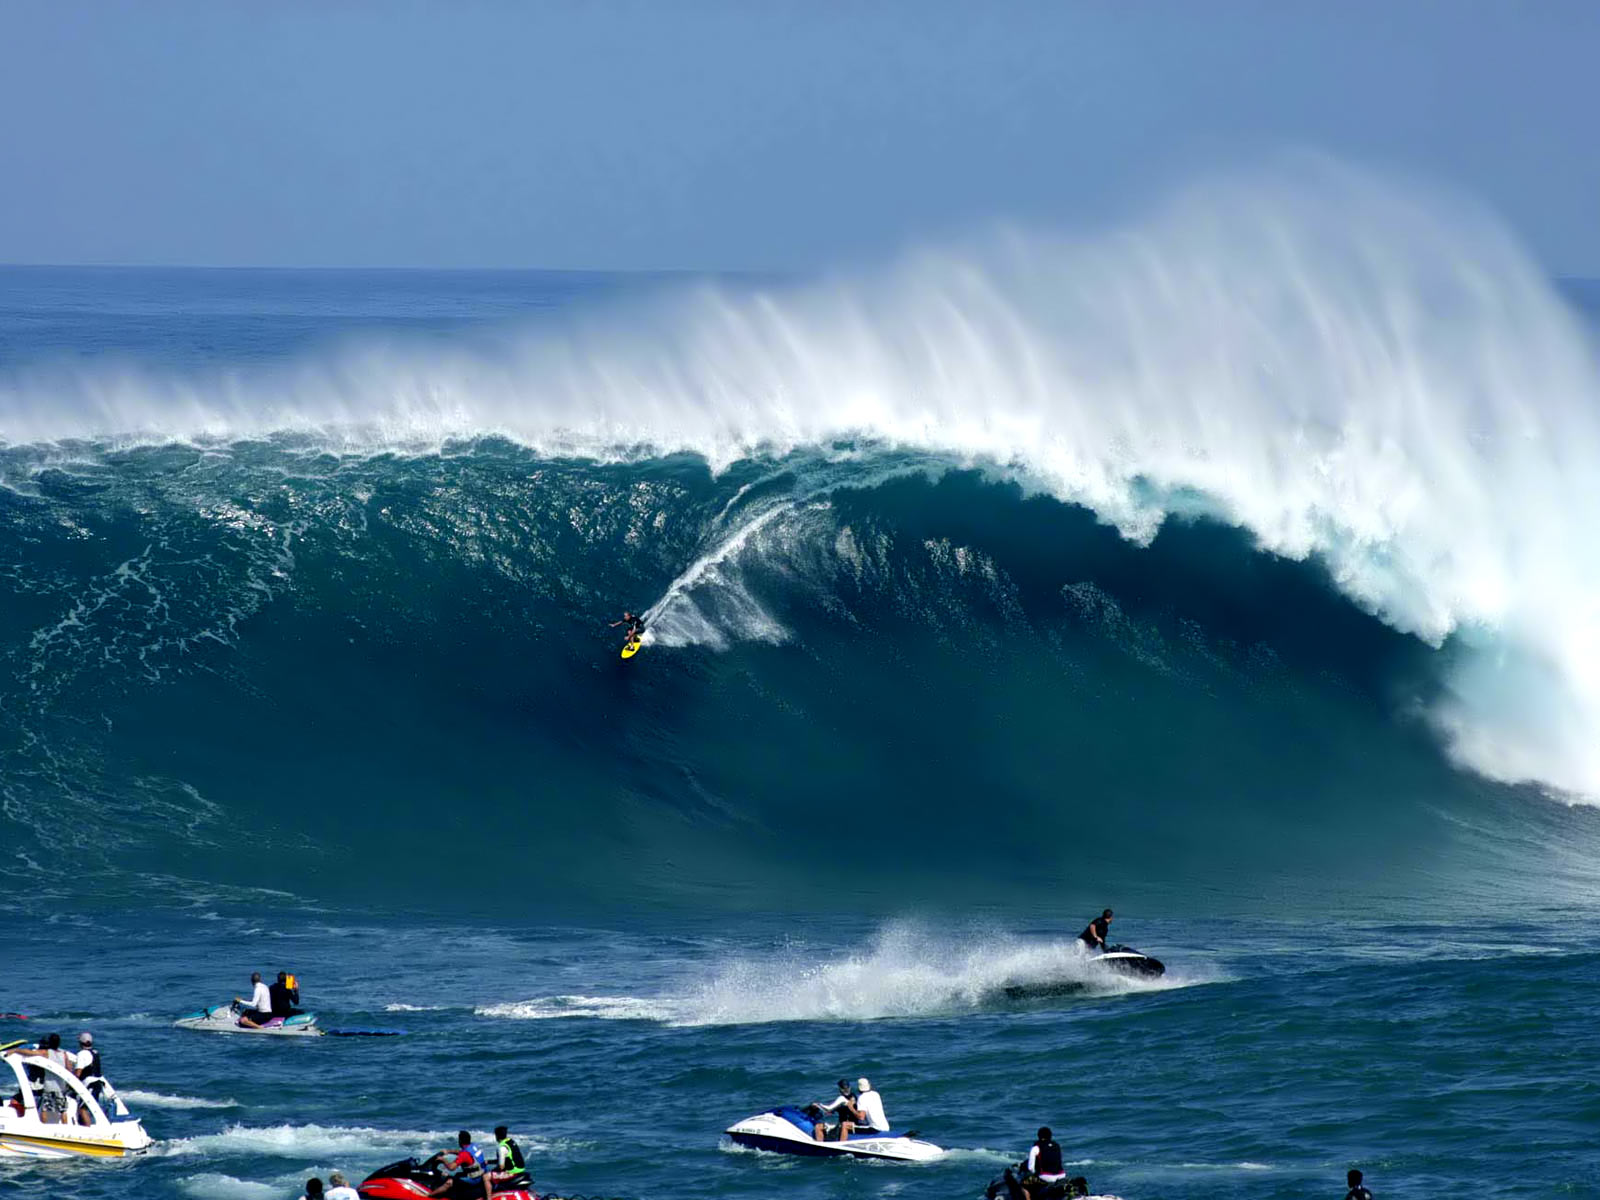 Gambar Gambar Berselancar Surfing Di Lautan